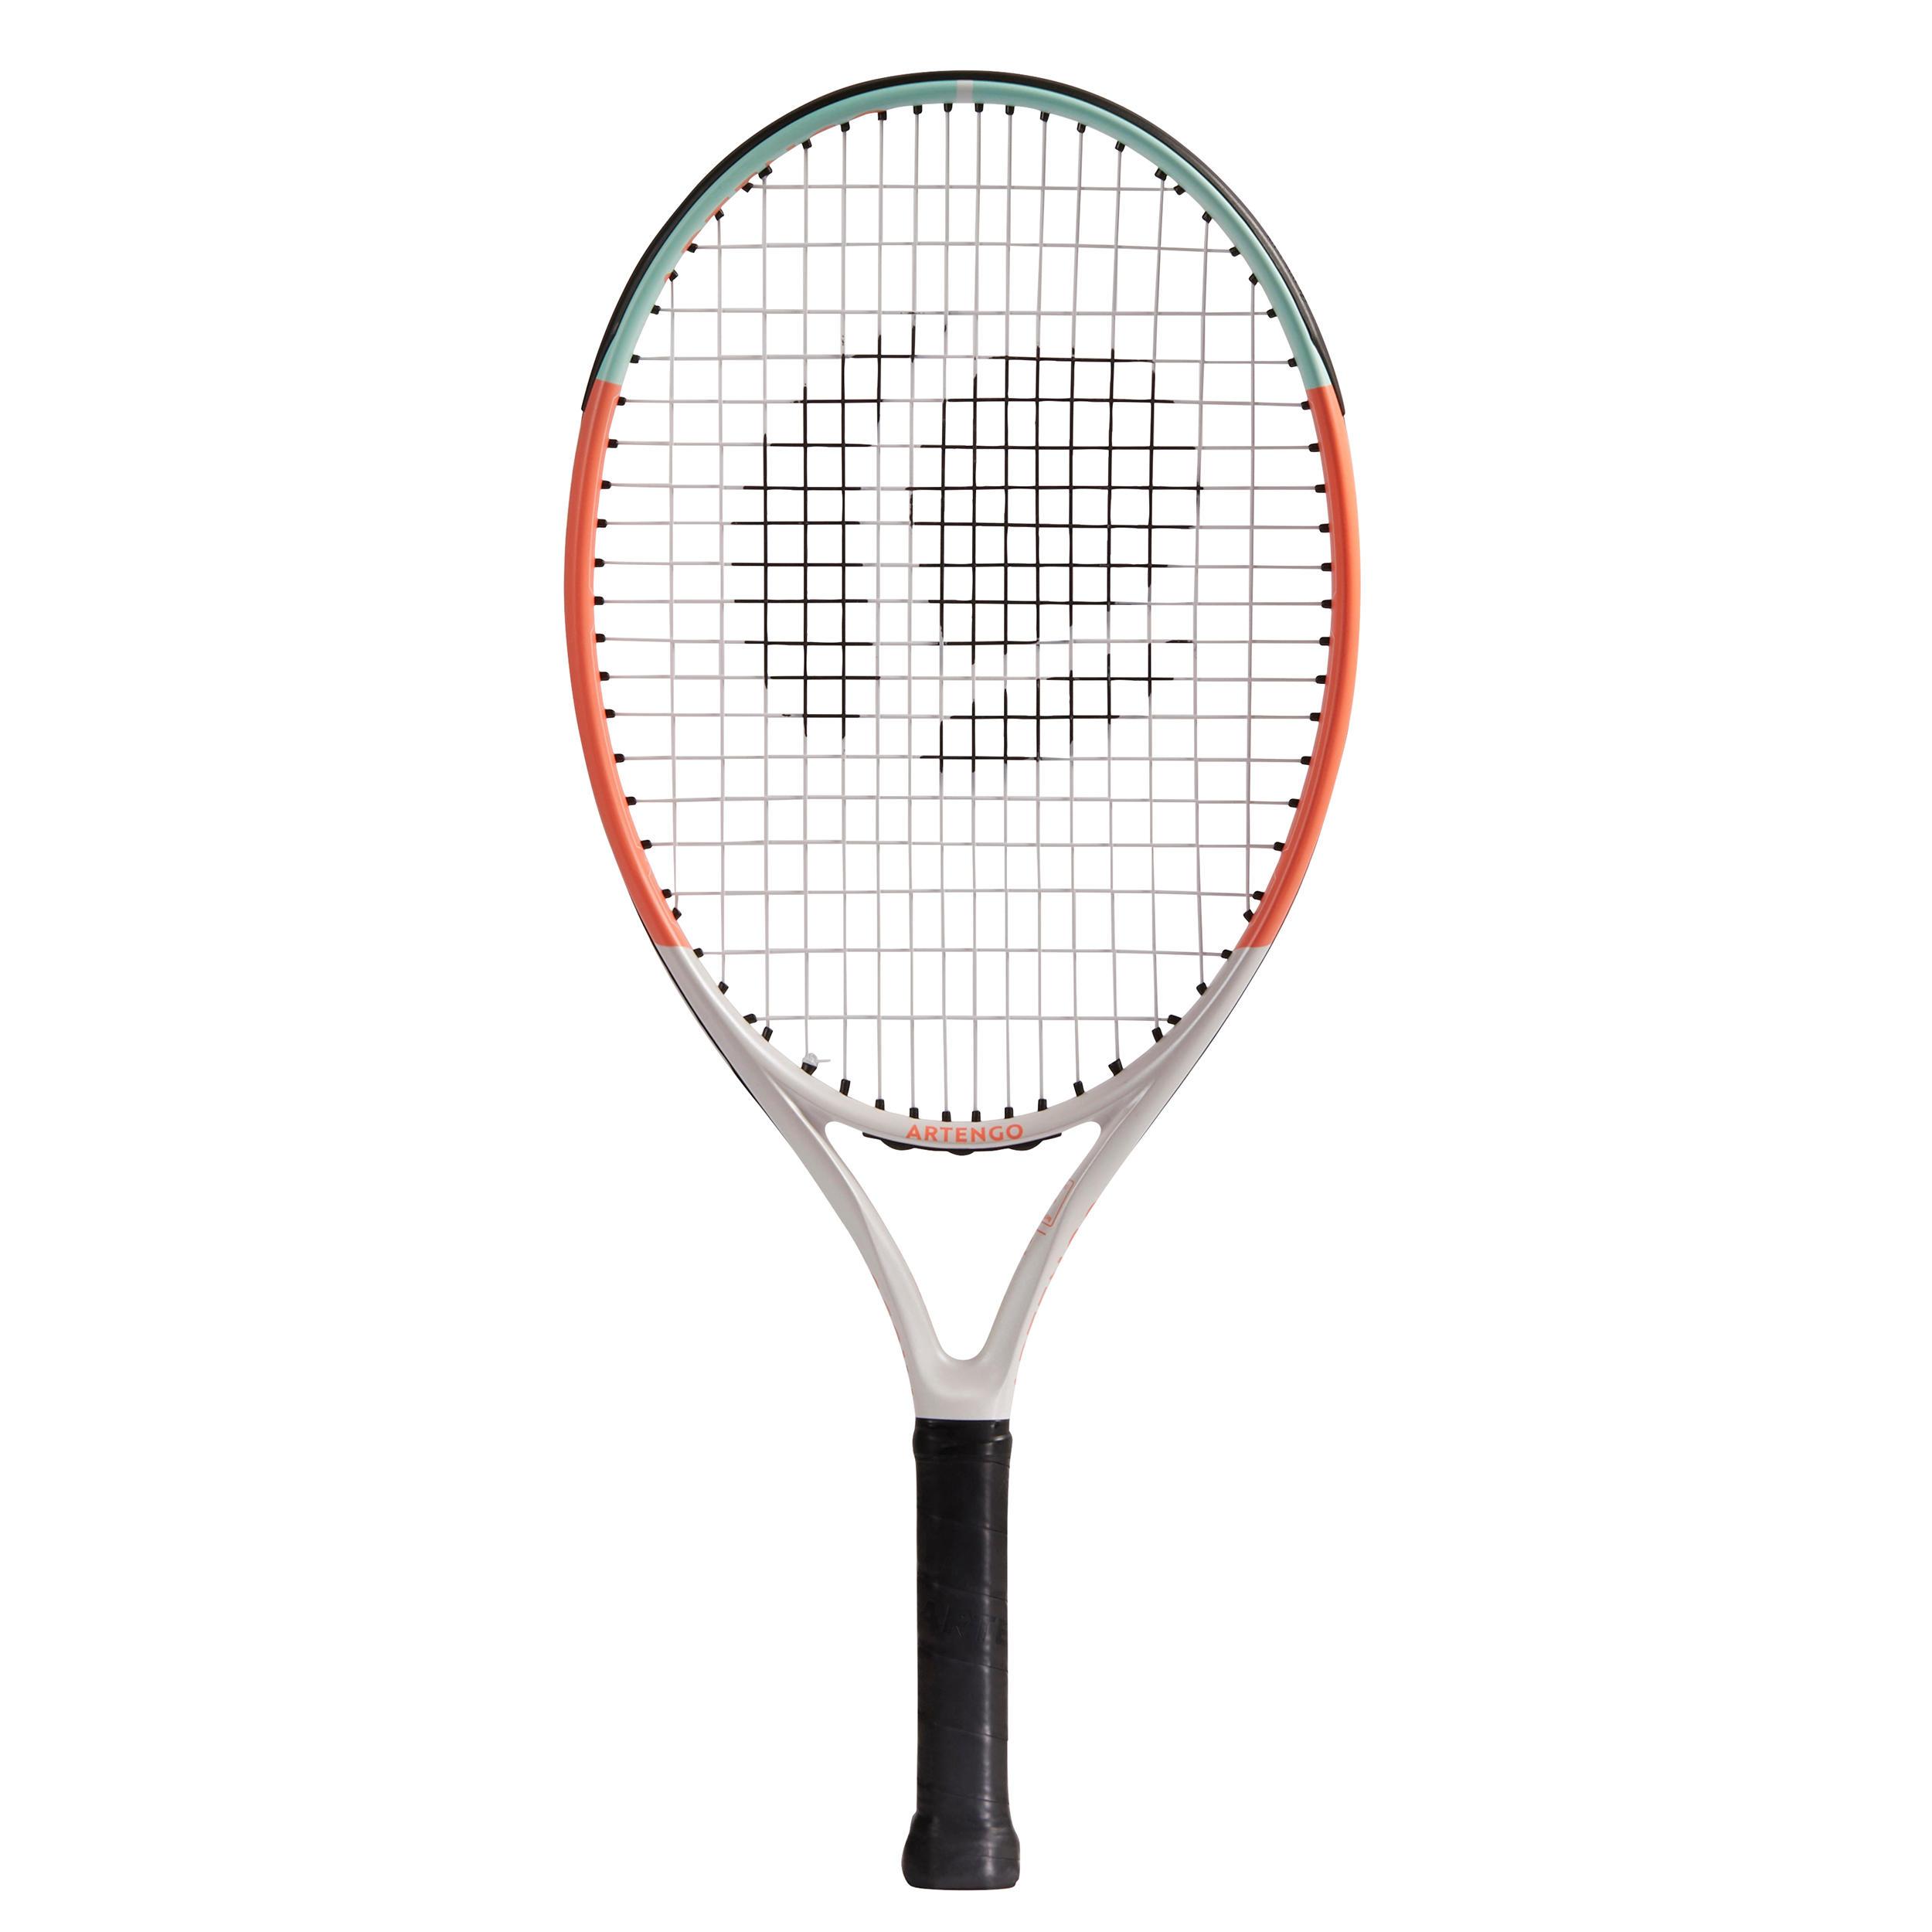 Rachetă Tenis TR530 23 Copii